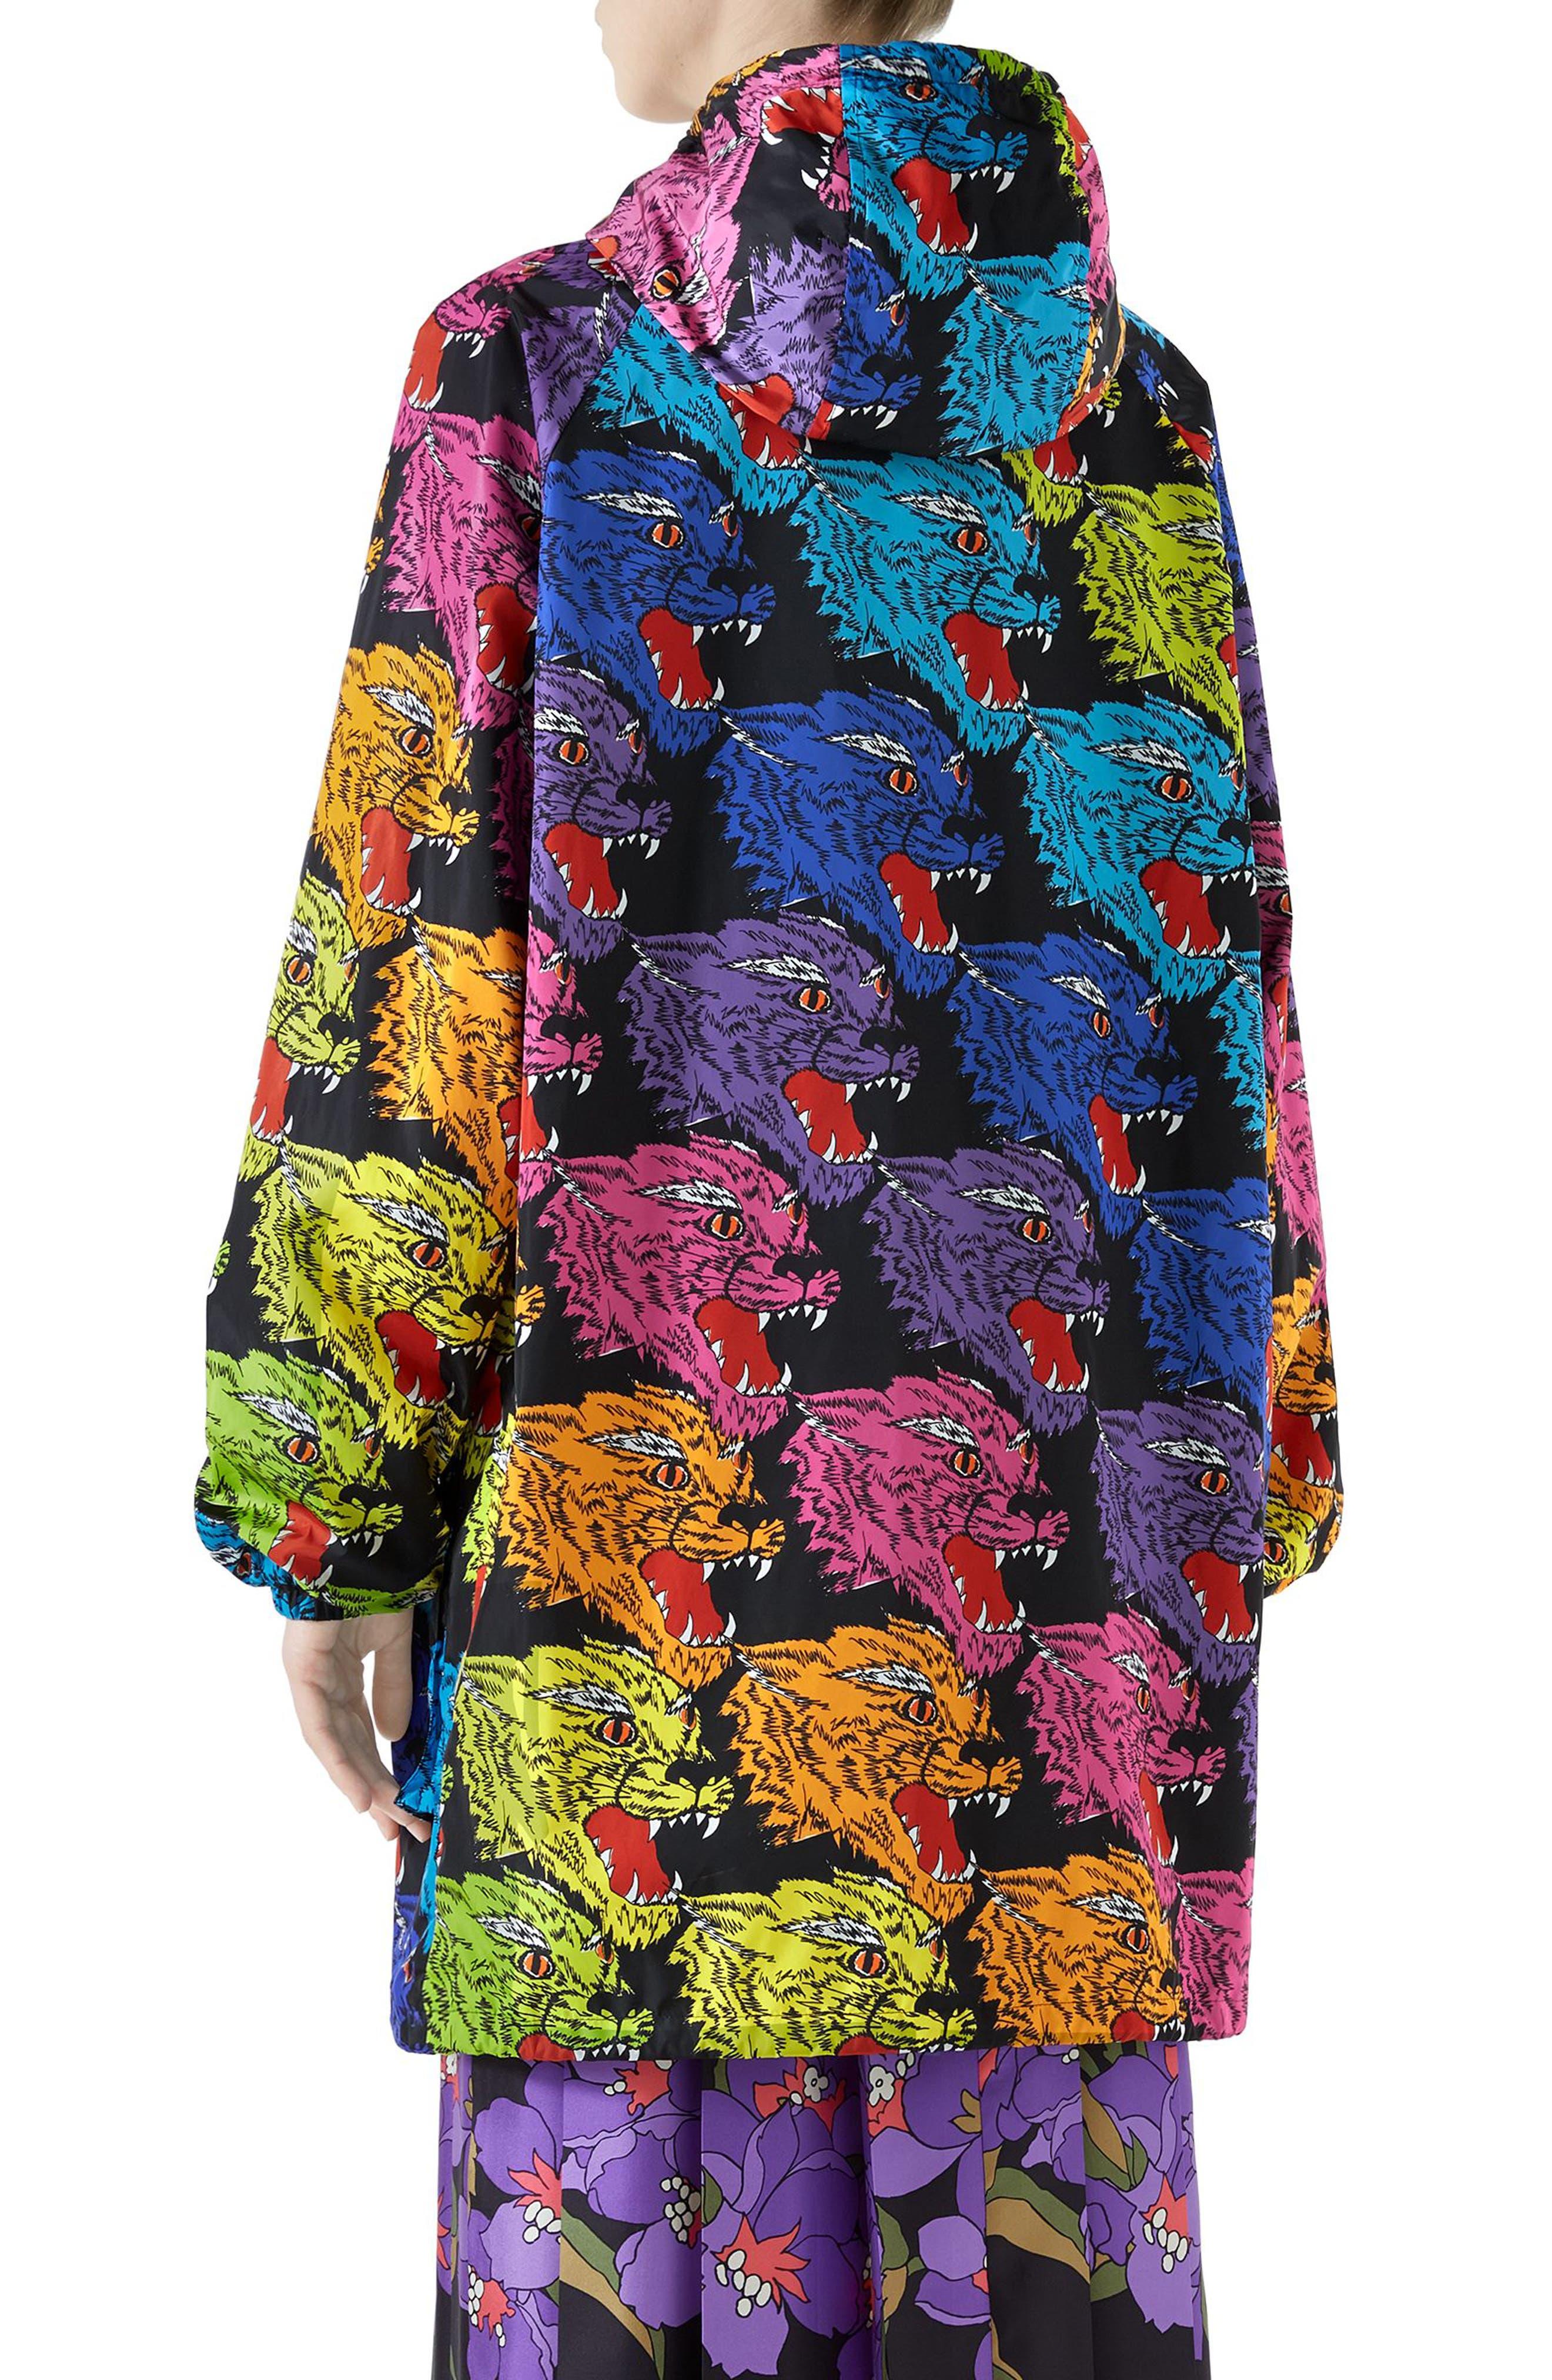 Rainbow Panther Hooded Jacket,                             Alternate thumbnail 2, color,                             RAINBOW PRINT